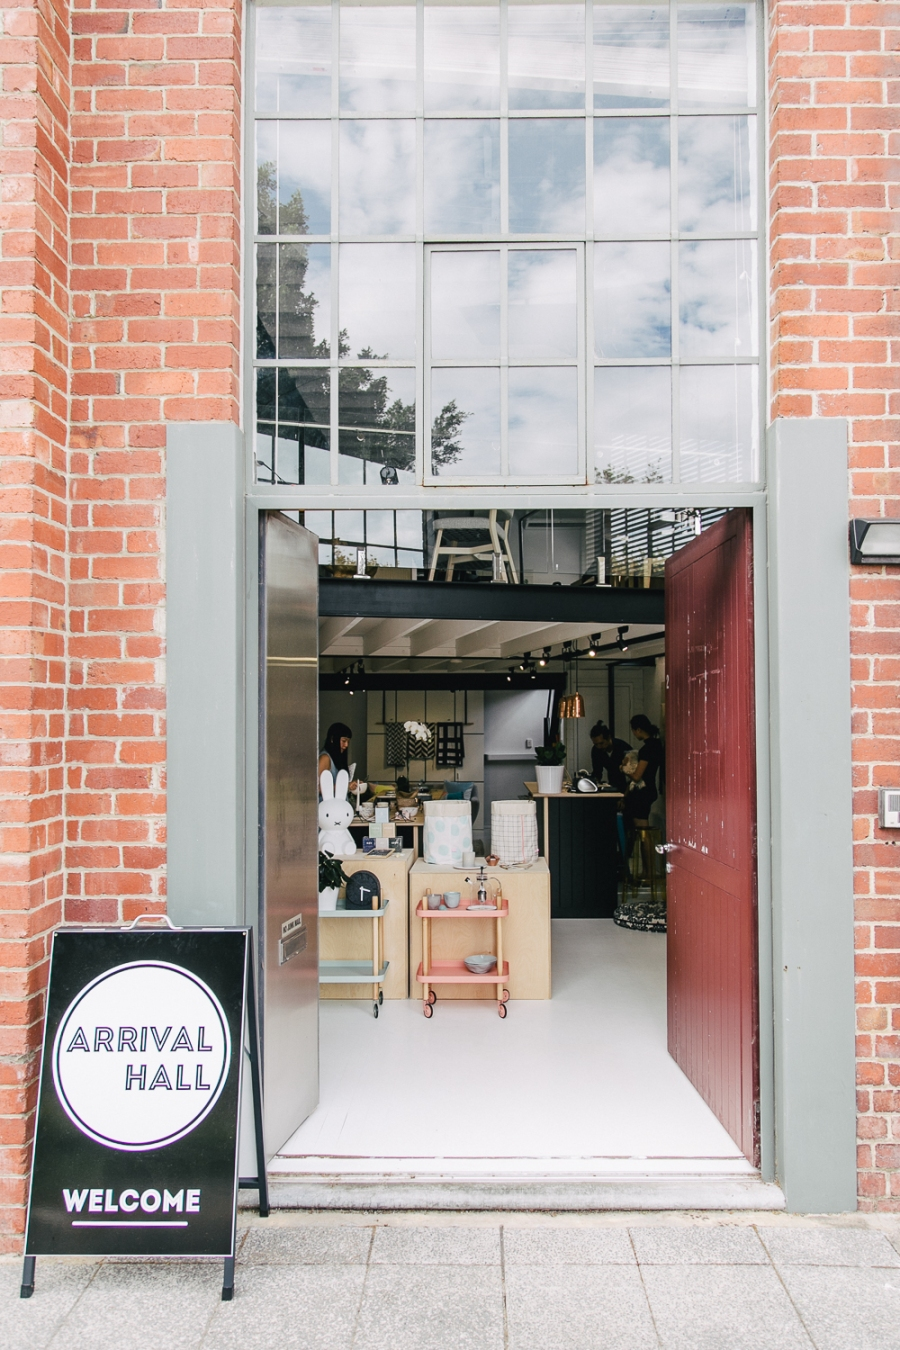 arrival-hall-17